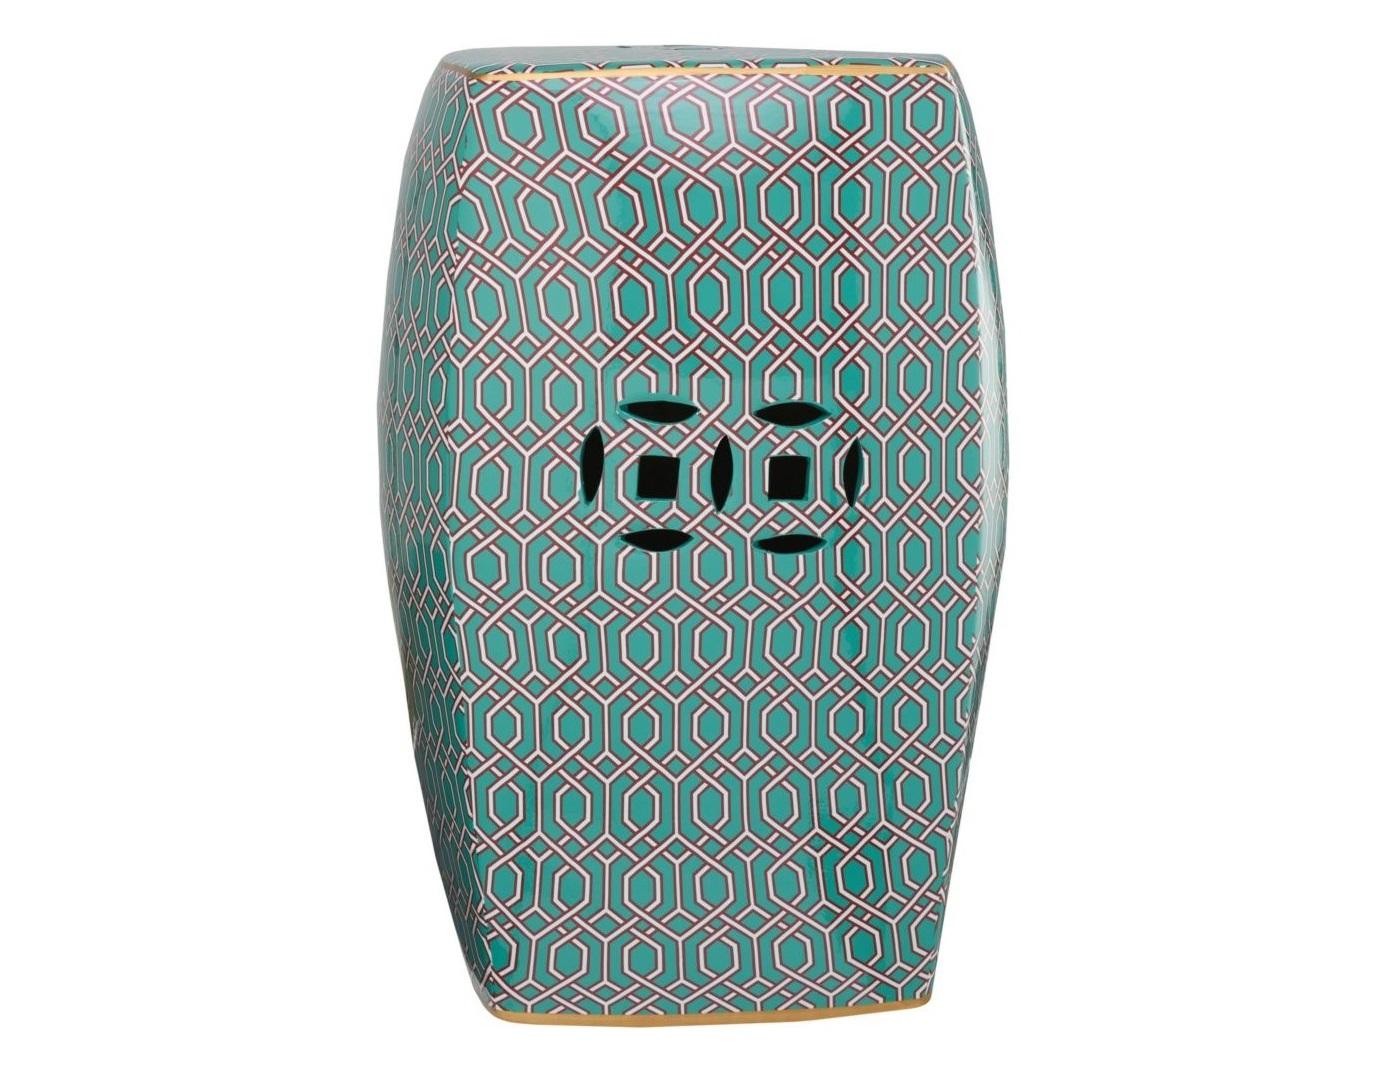 Табурет ModelloТабуреты<br><br><br>Material: Керамика<br>Ширина см: 33<br>Высота см: 50<br>Глубина см: 33